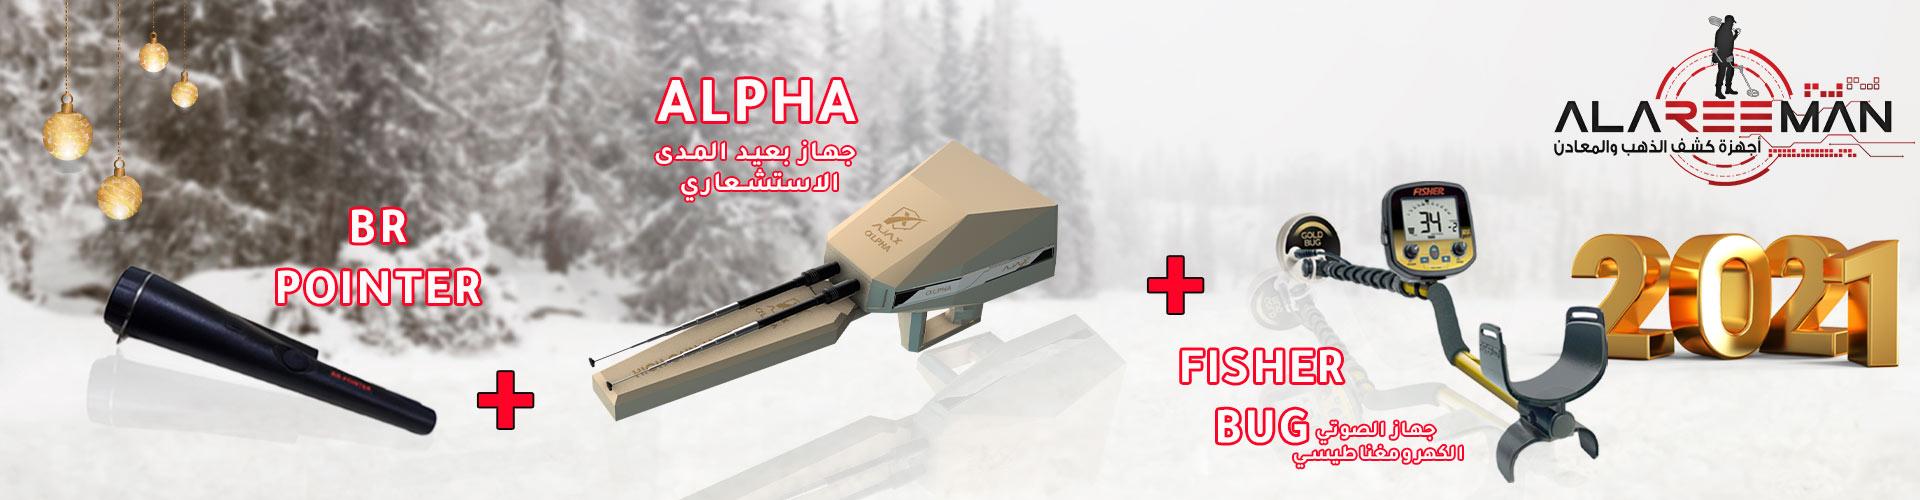 Offer Happy New Year Alpha+ FisherBug